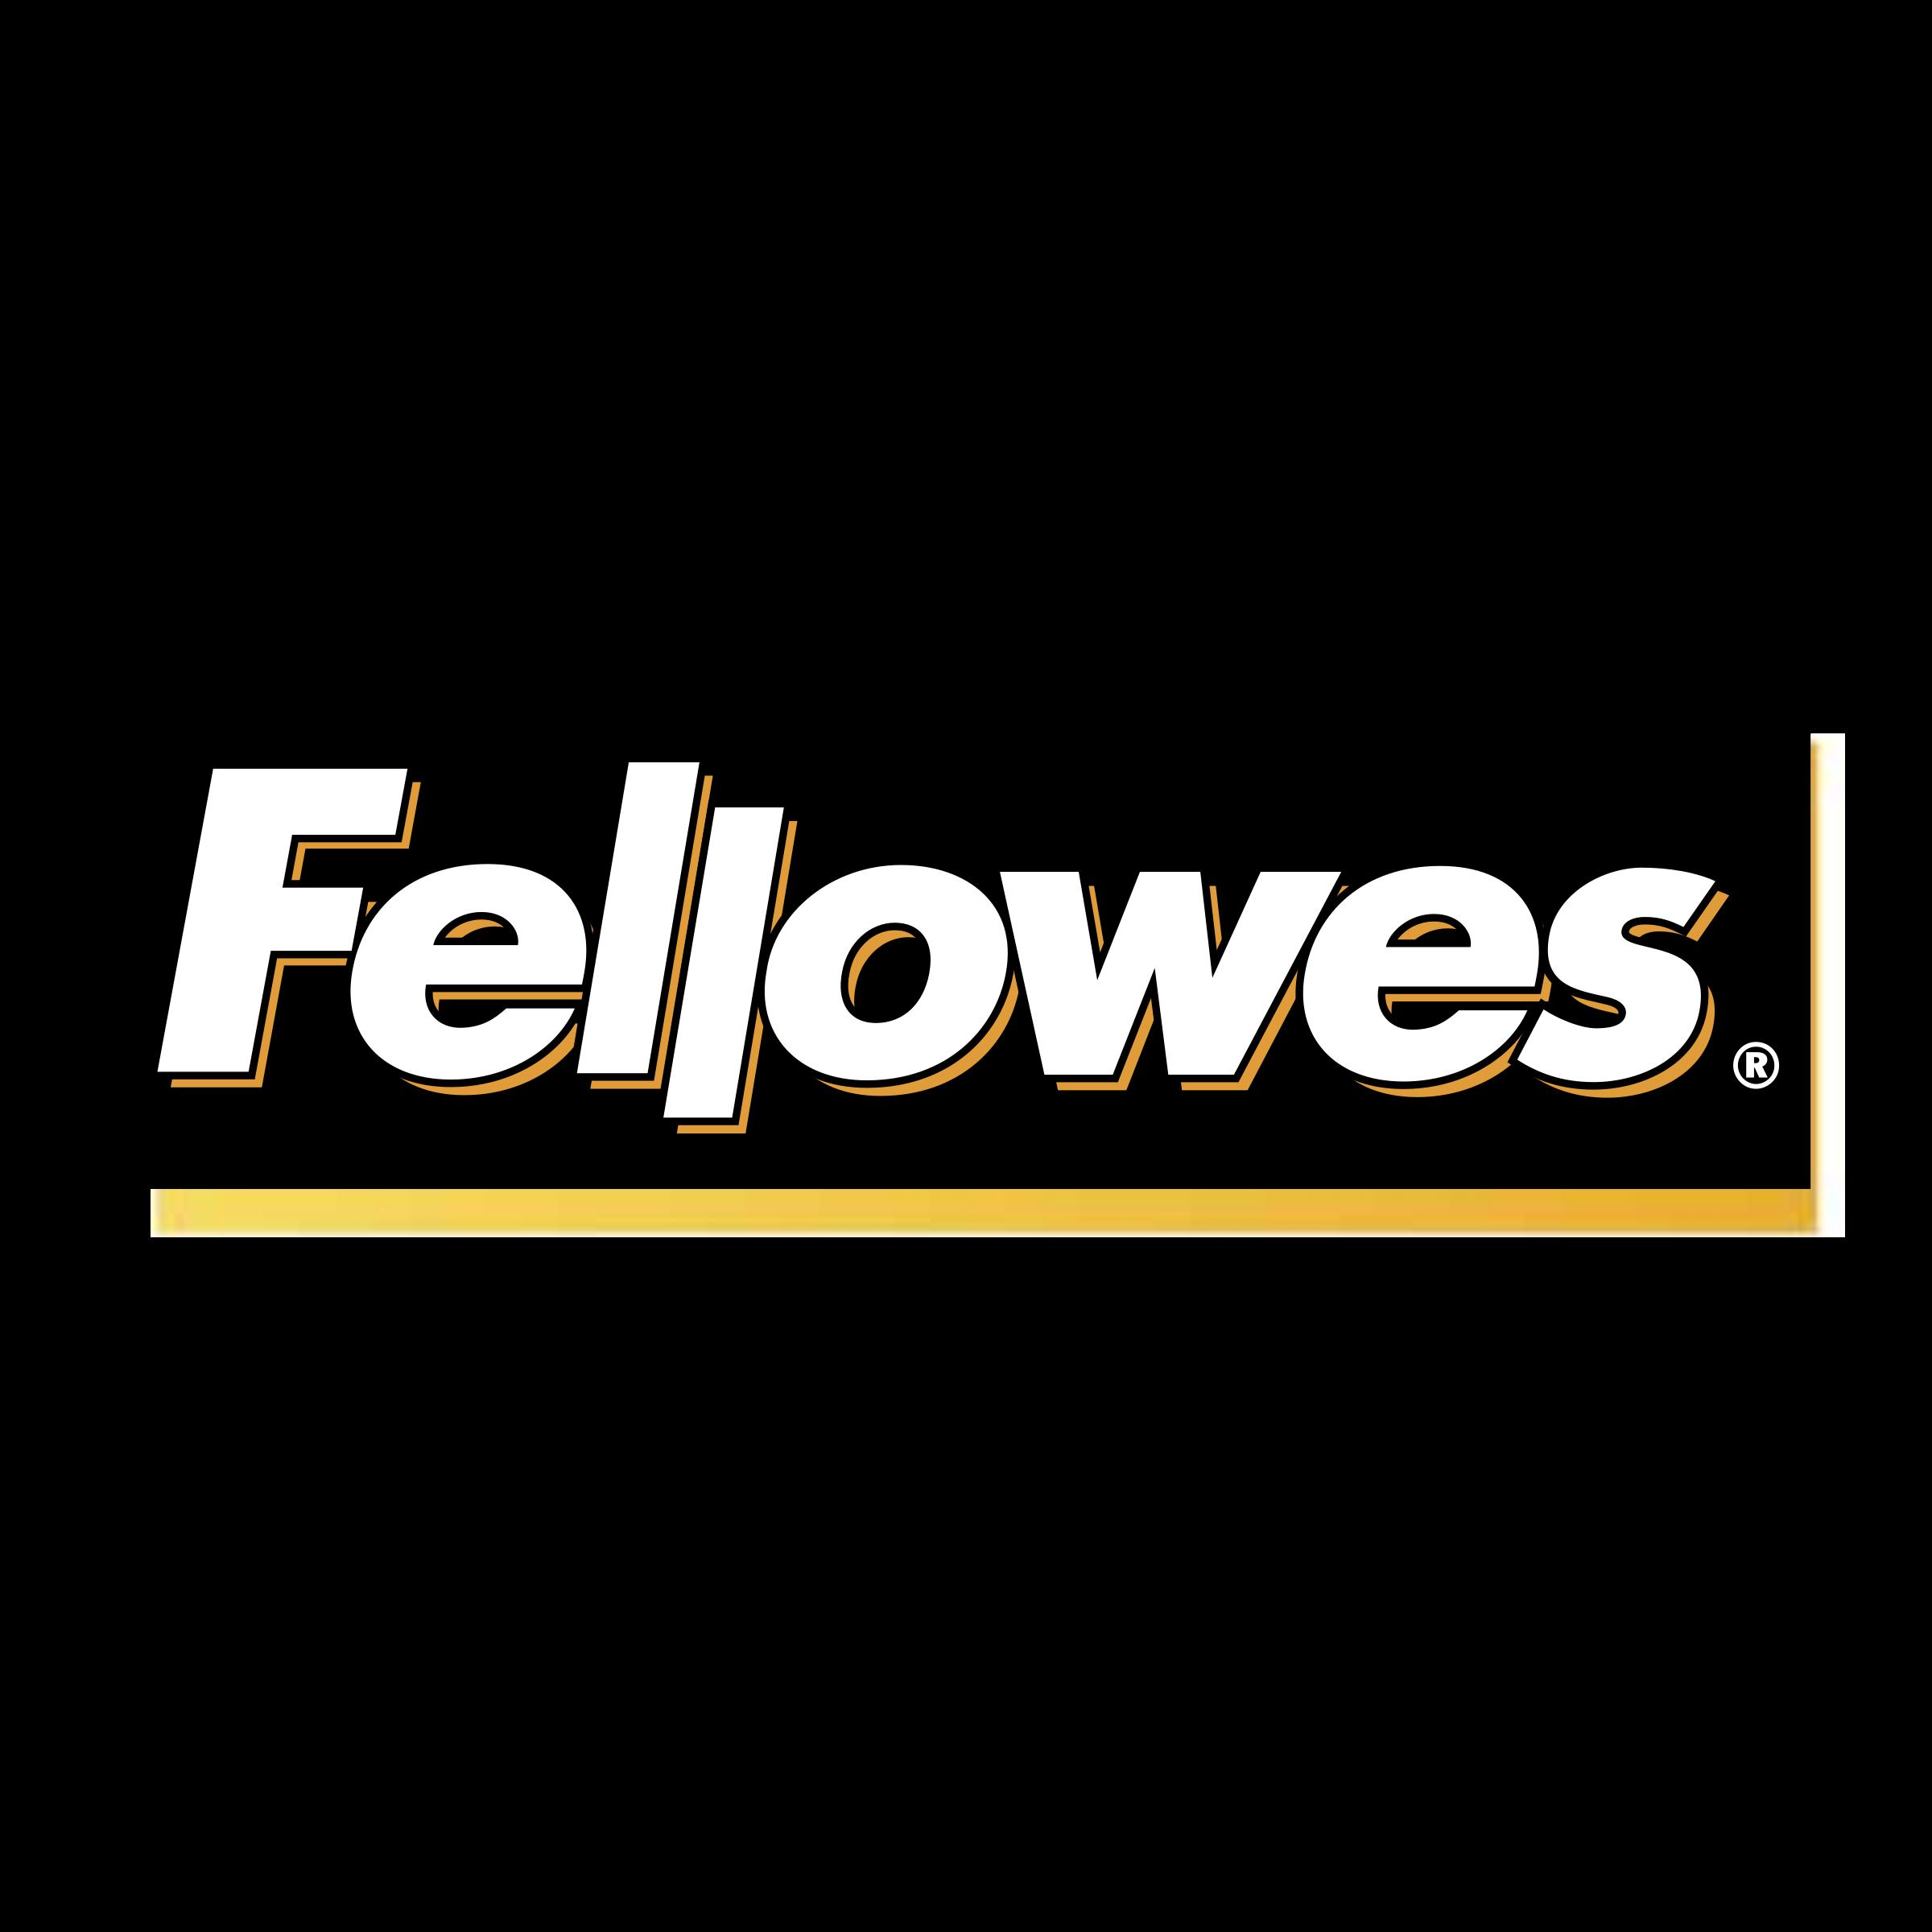 fellowes logo.png